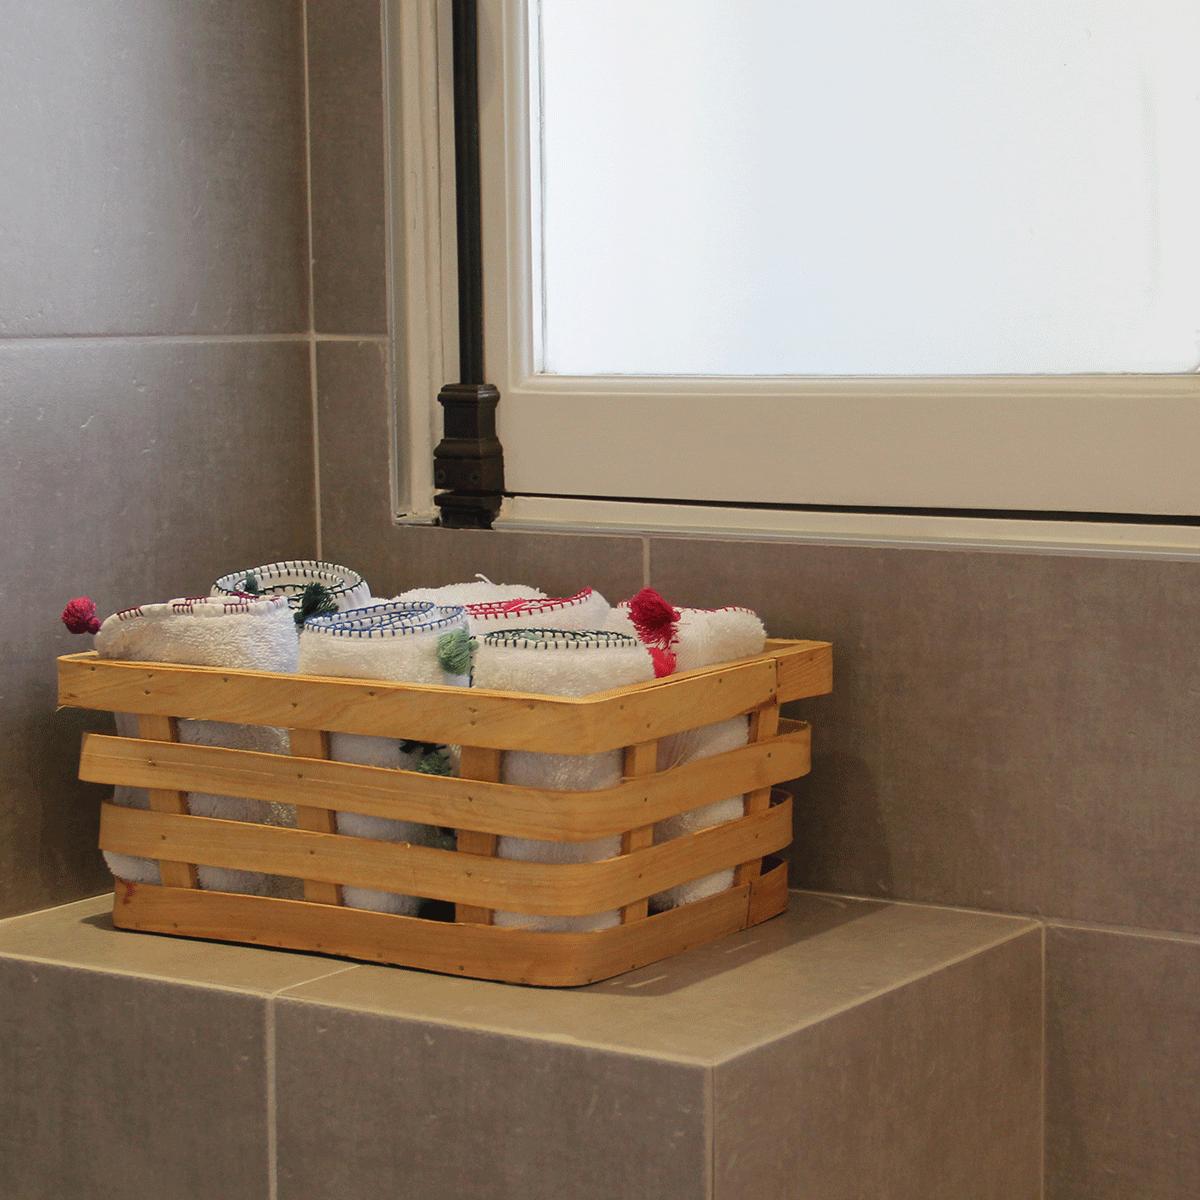 Panier rangement en bois salle de bain for Rangement salle de bain bois